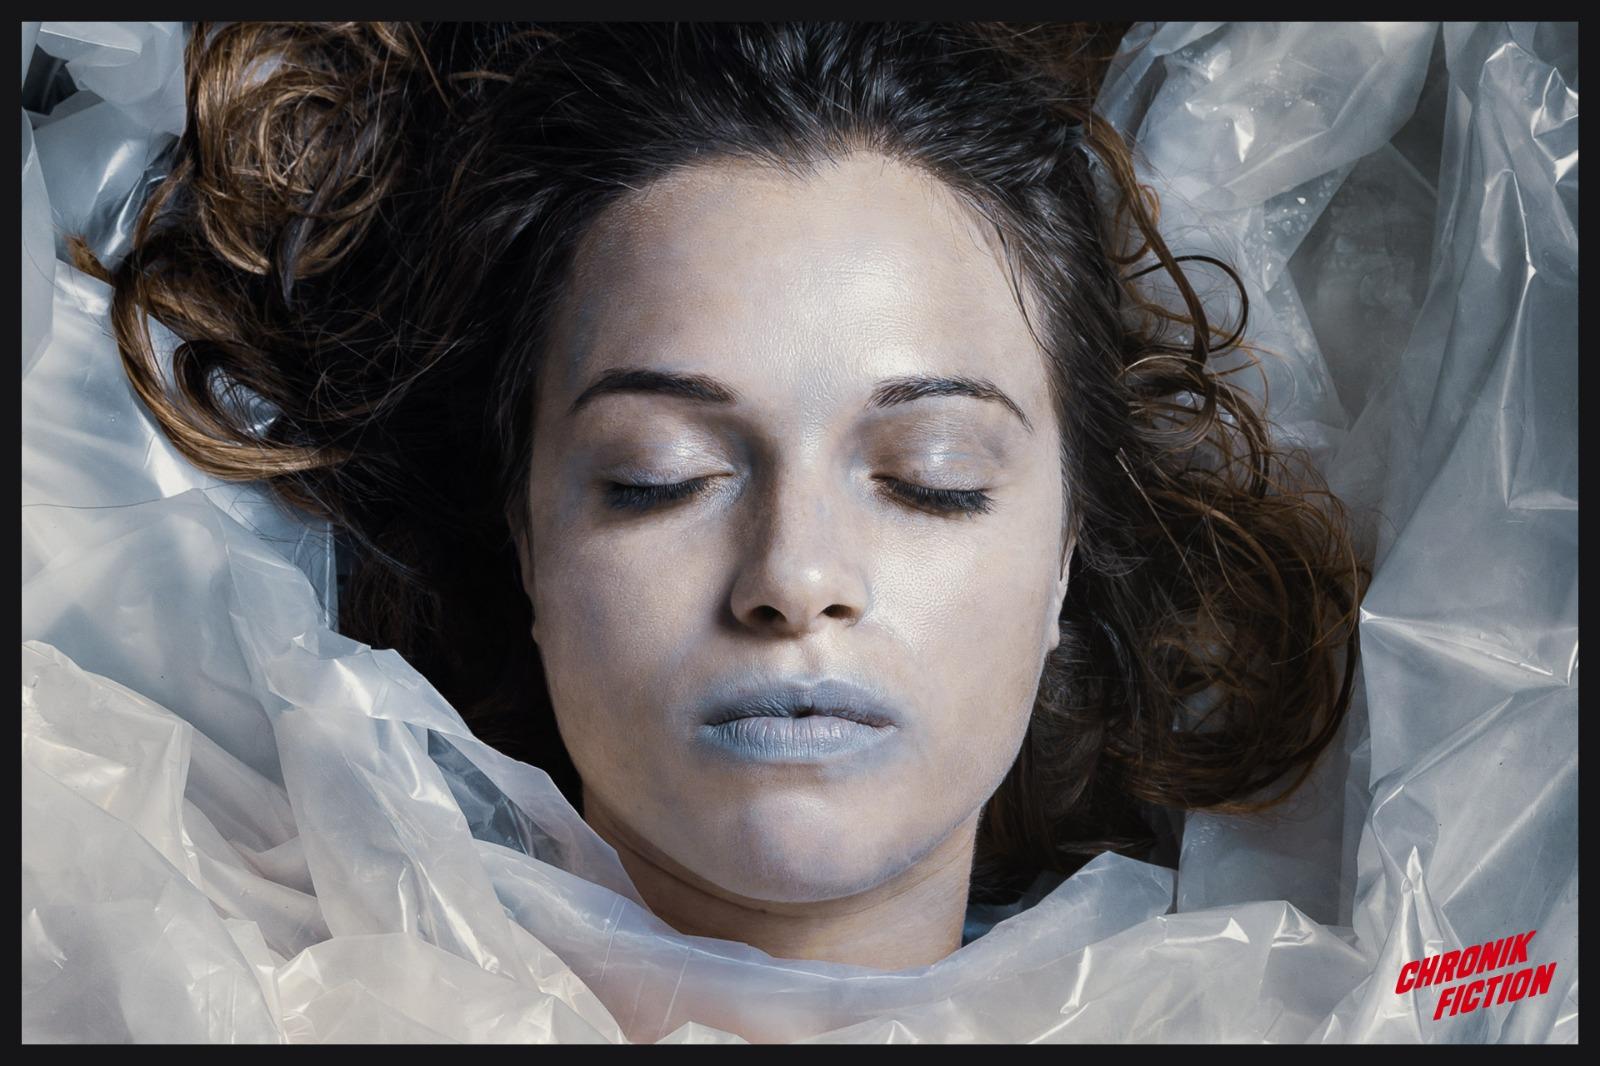 Chronik Fiction - Twin Peaks artwork